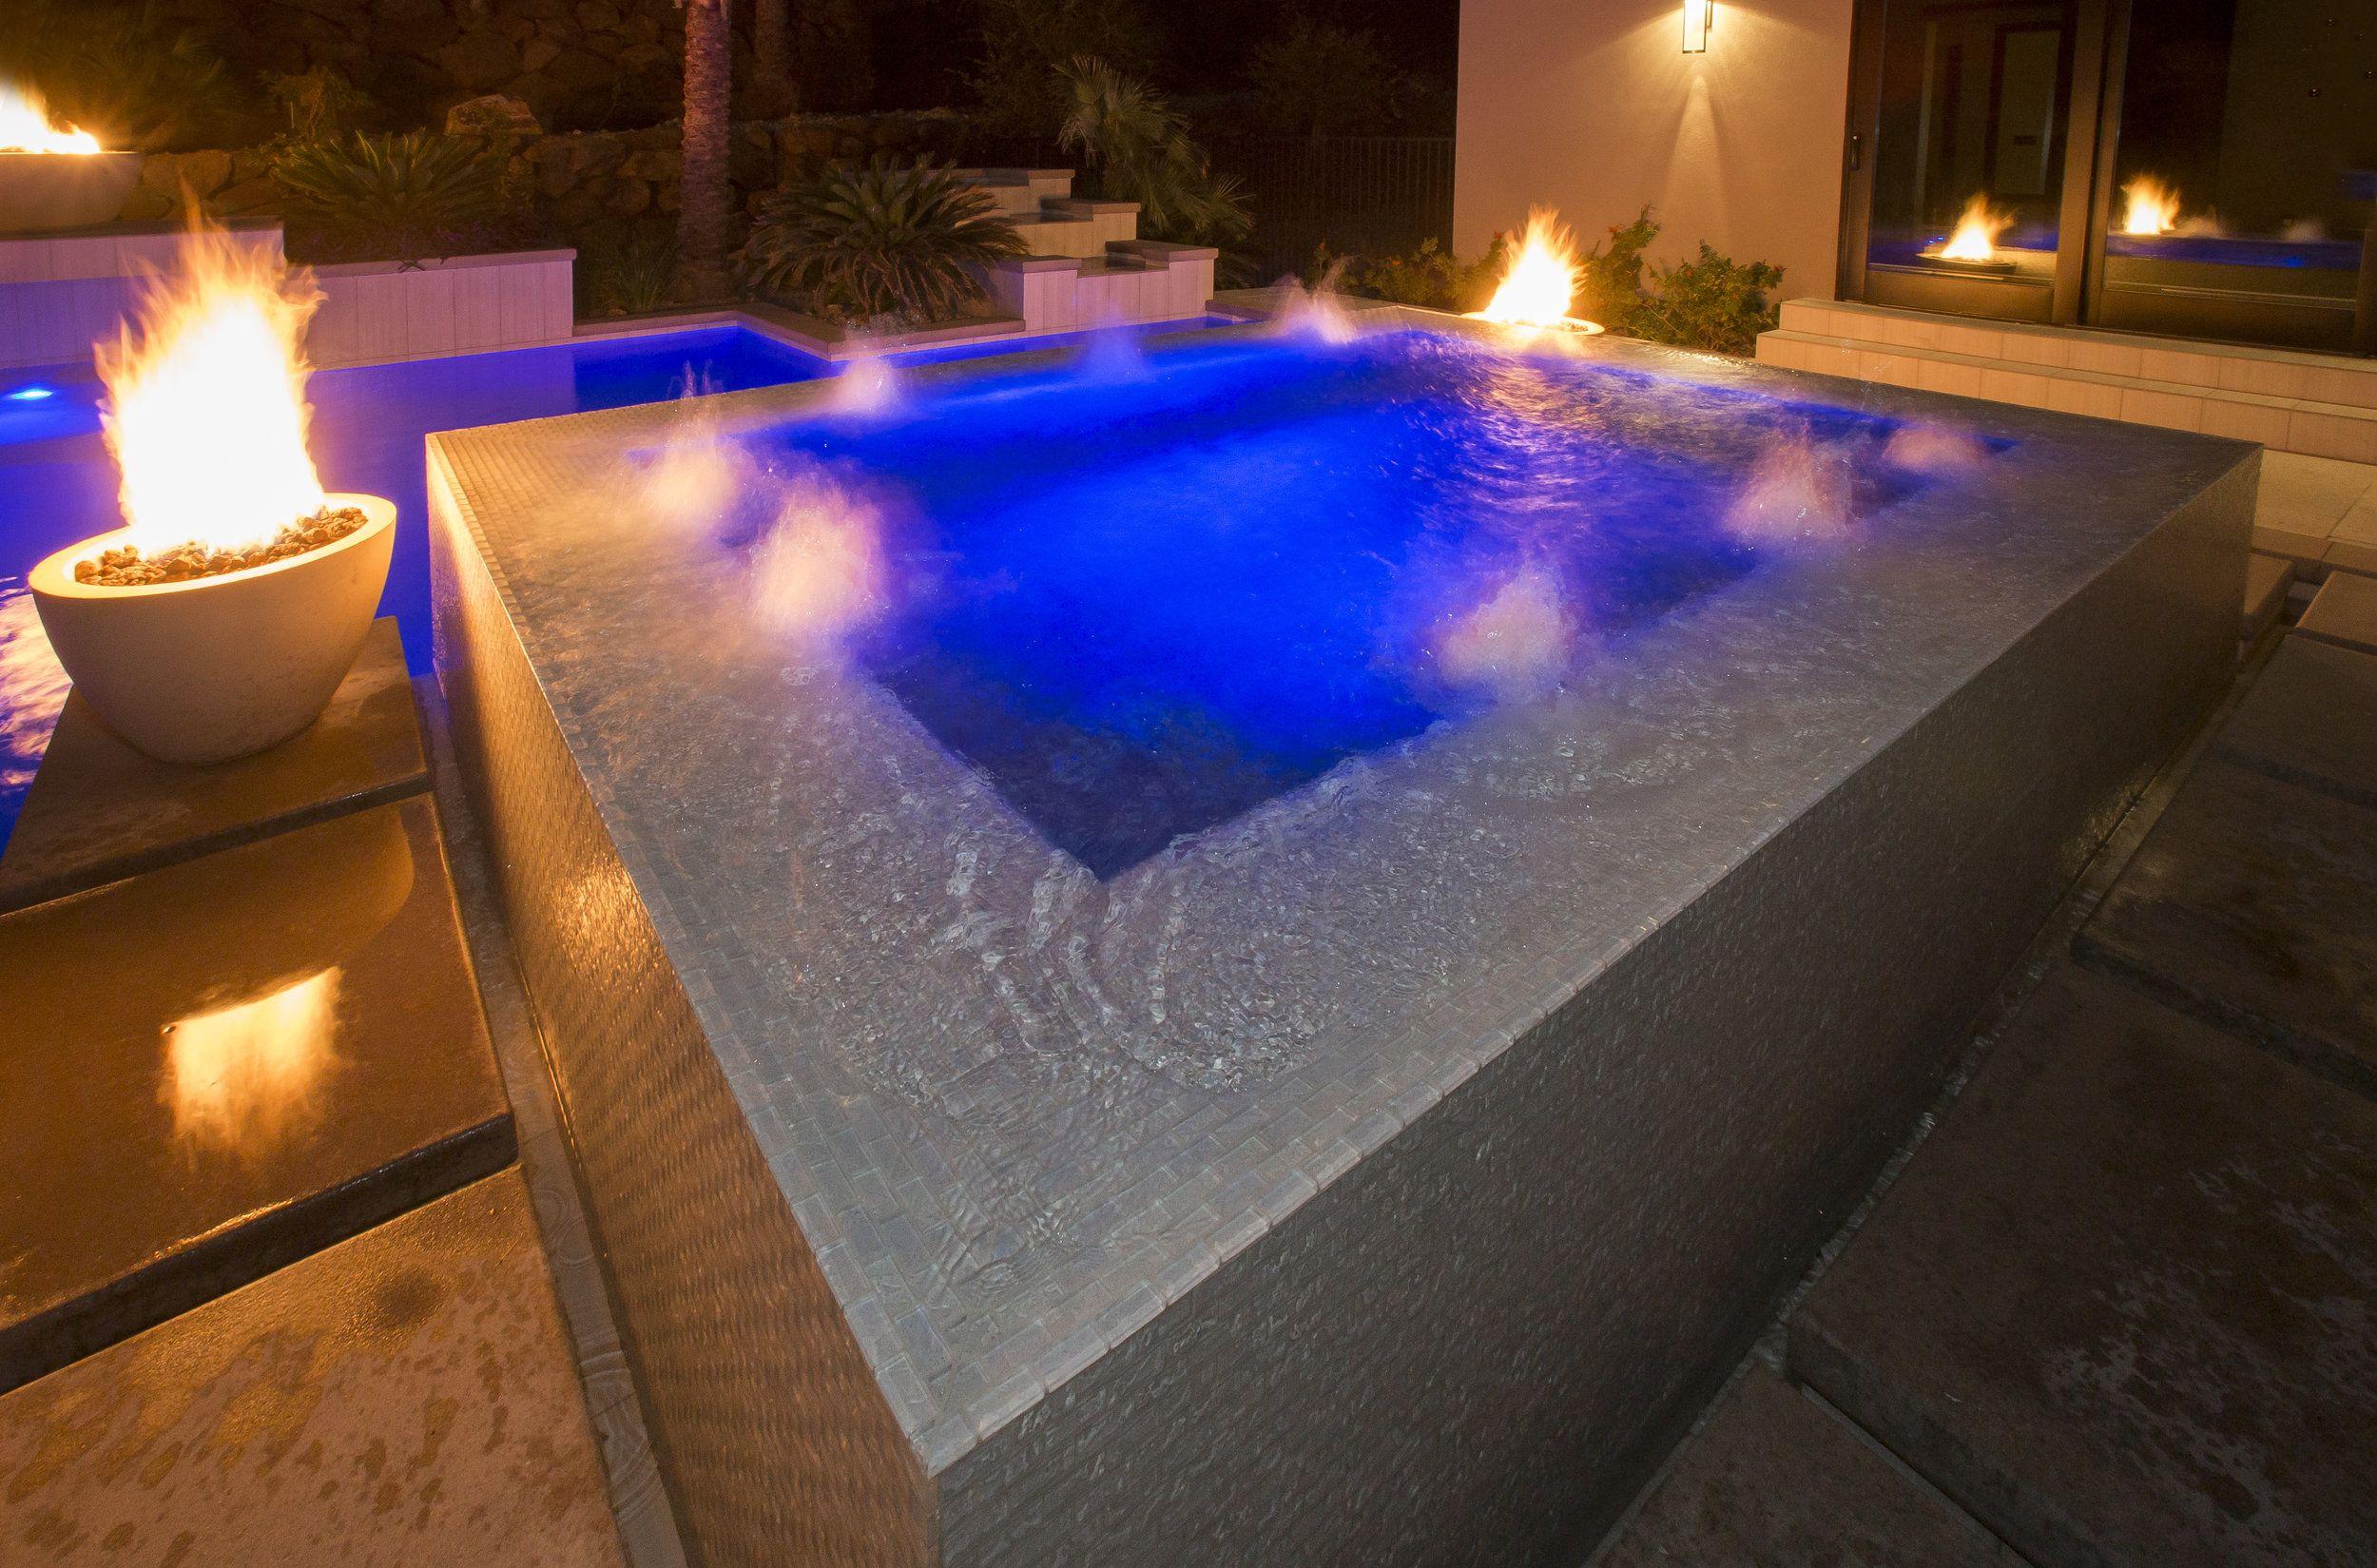 California Pools Las Vegas Nv Info Californiapools Com 800 282 7665 California Pools Pool Oasis Swimming Pool